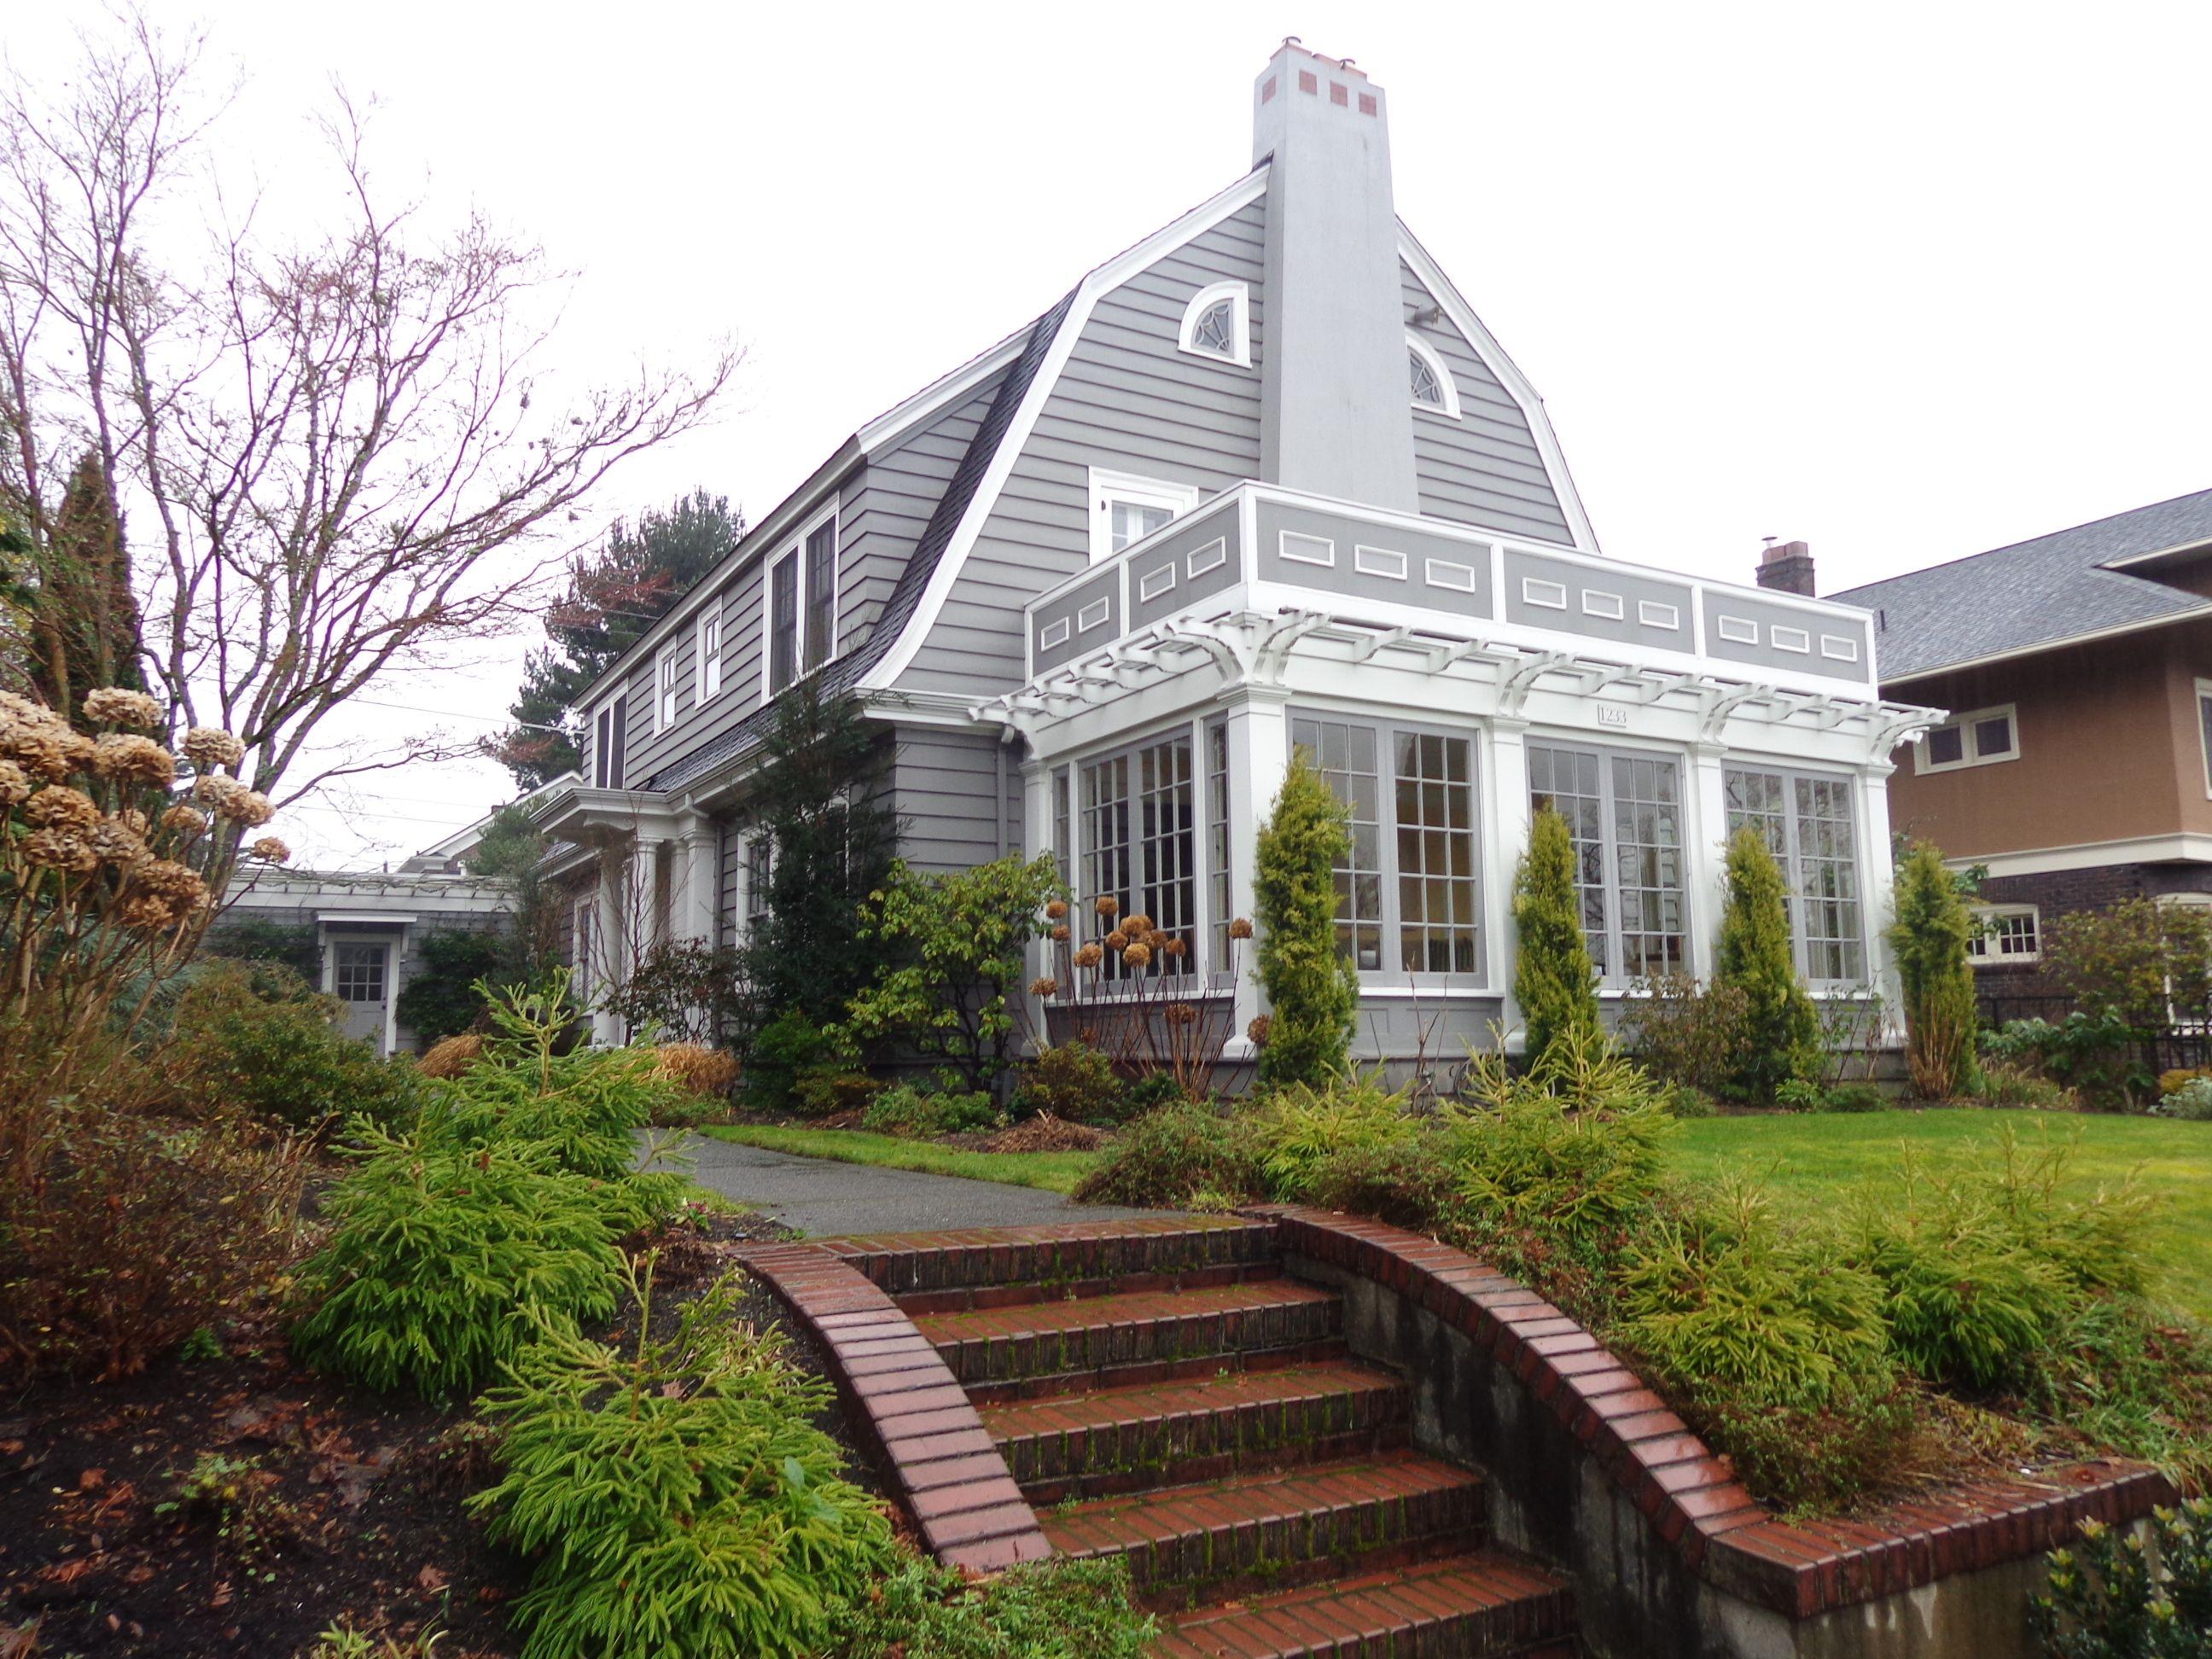 dutch colonial exterior colors porch pinterest. Black Bedroom Furniture Sets. Home Design Ideas